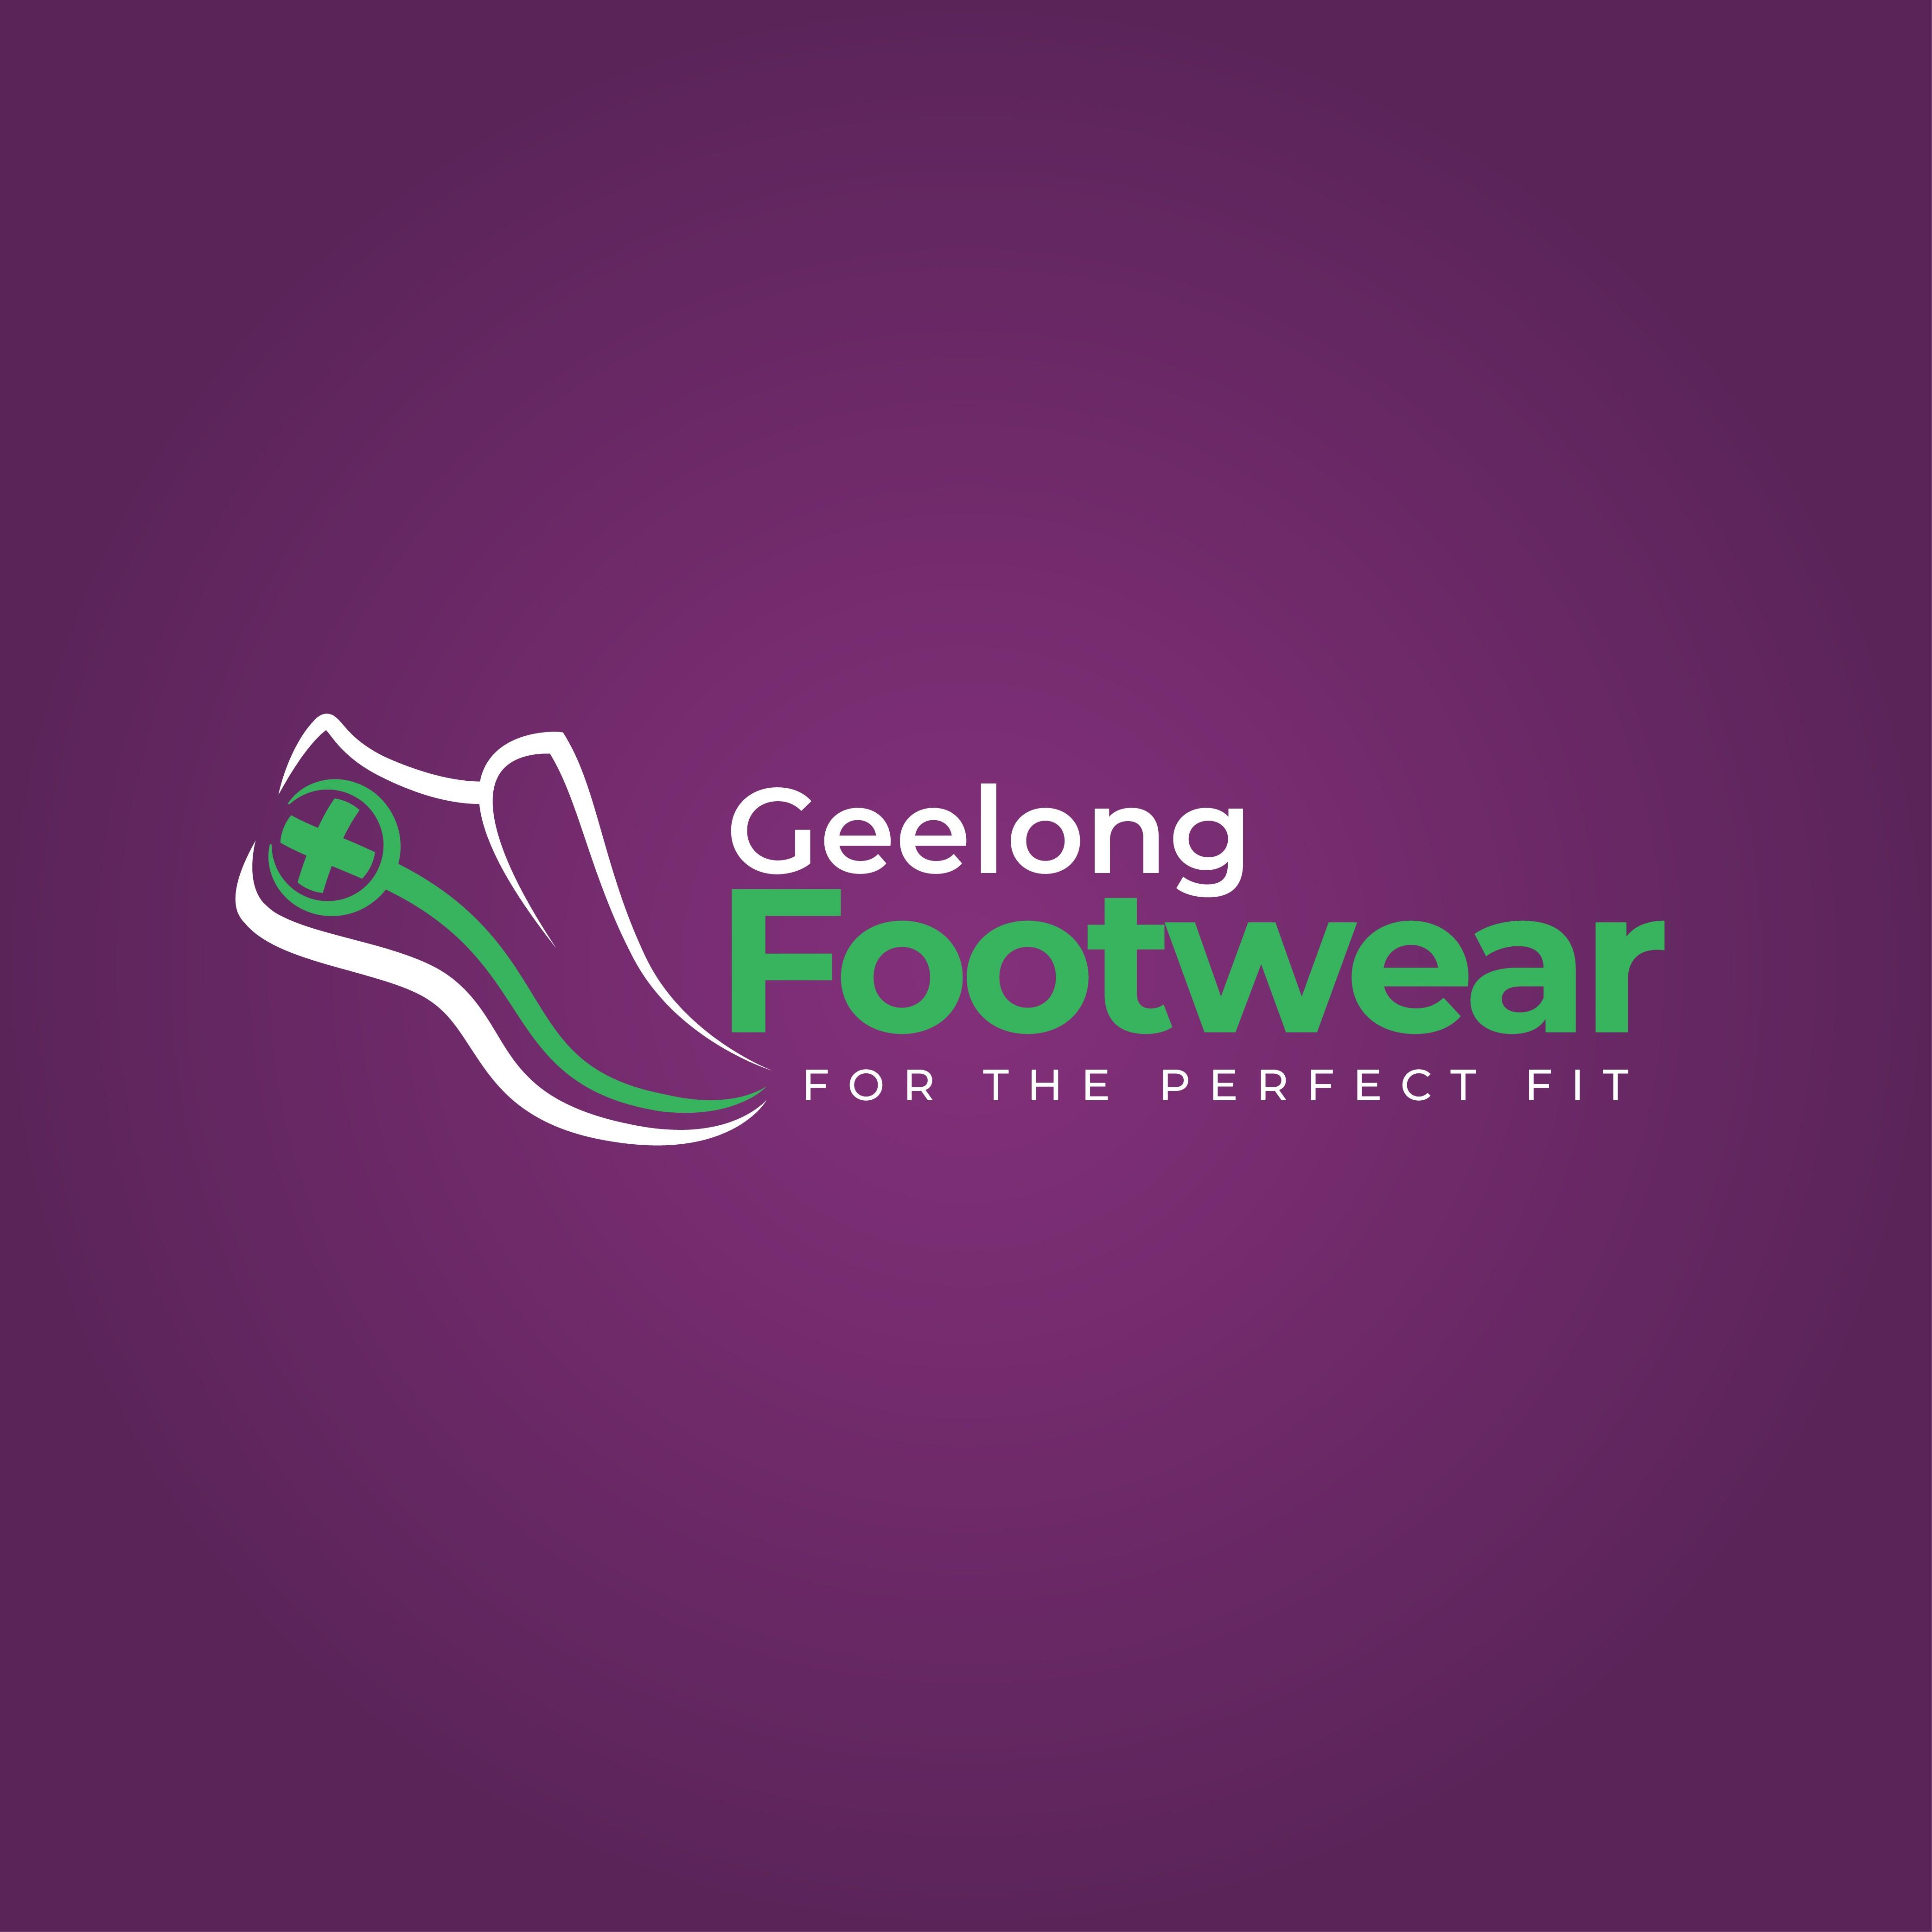 Geelong Footwear Logo for a company rebranding, re-freshing